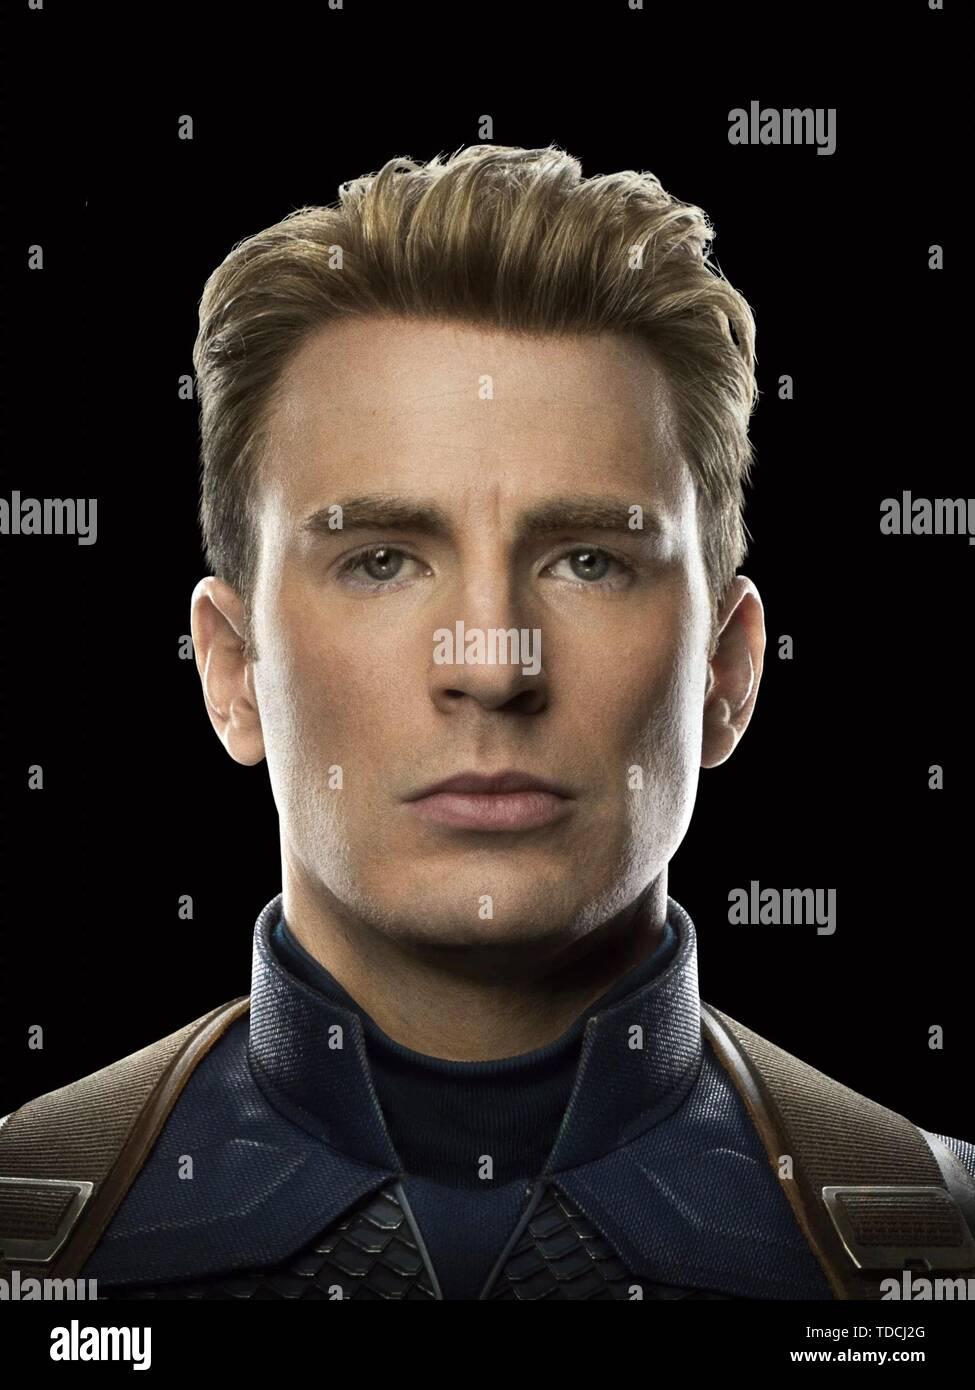 Chris Evans In Avengers Endgame 2019 Credit Marvel Studios Album Stock Photo Alamy